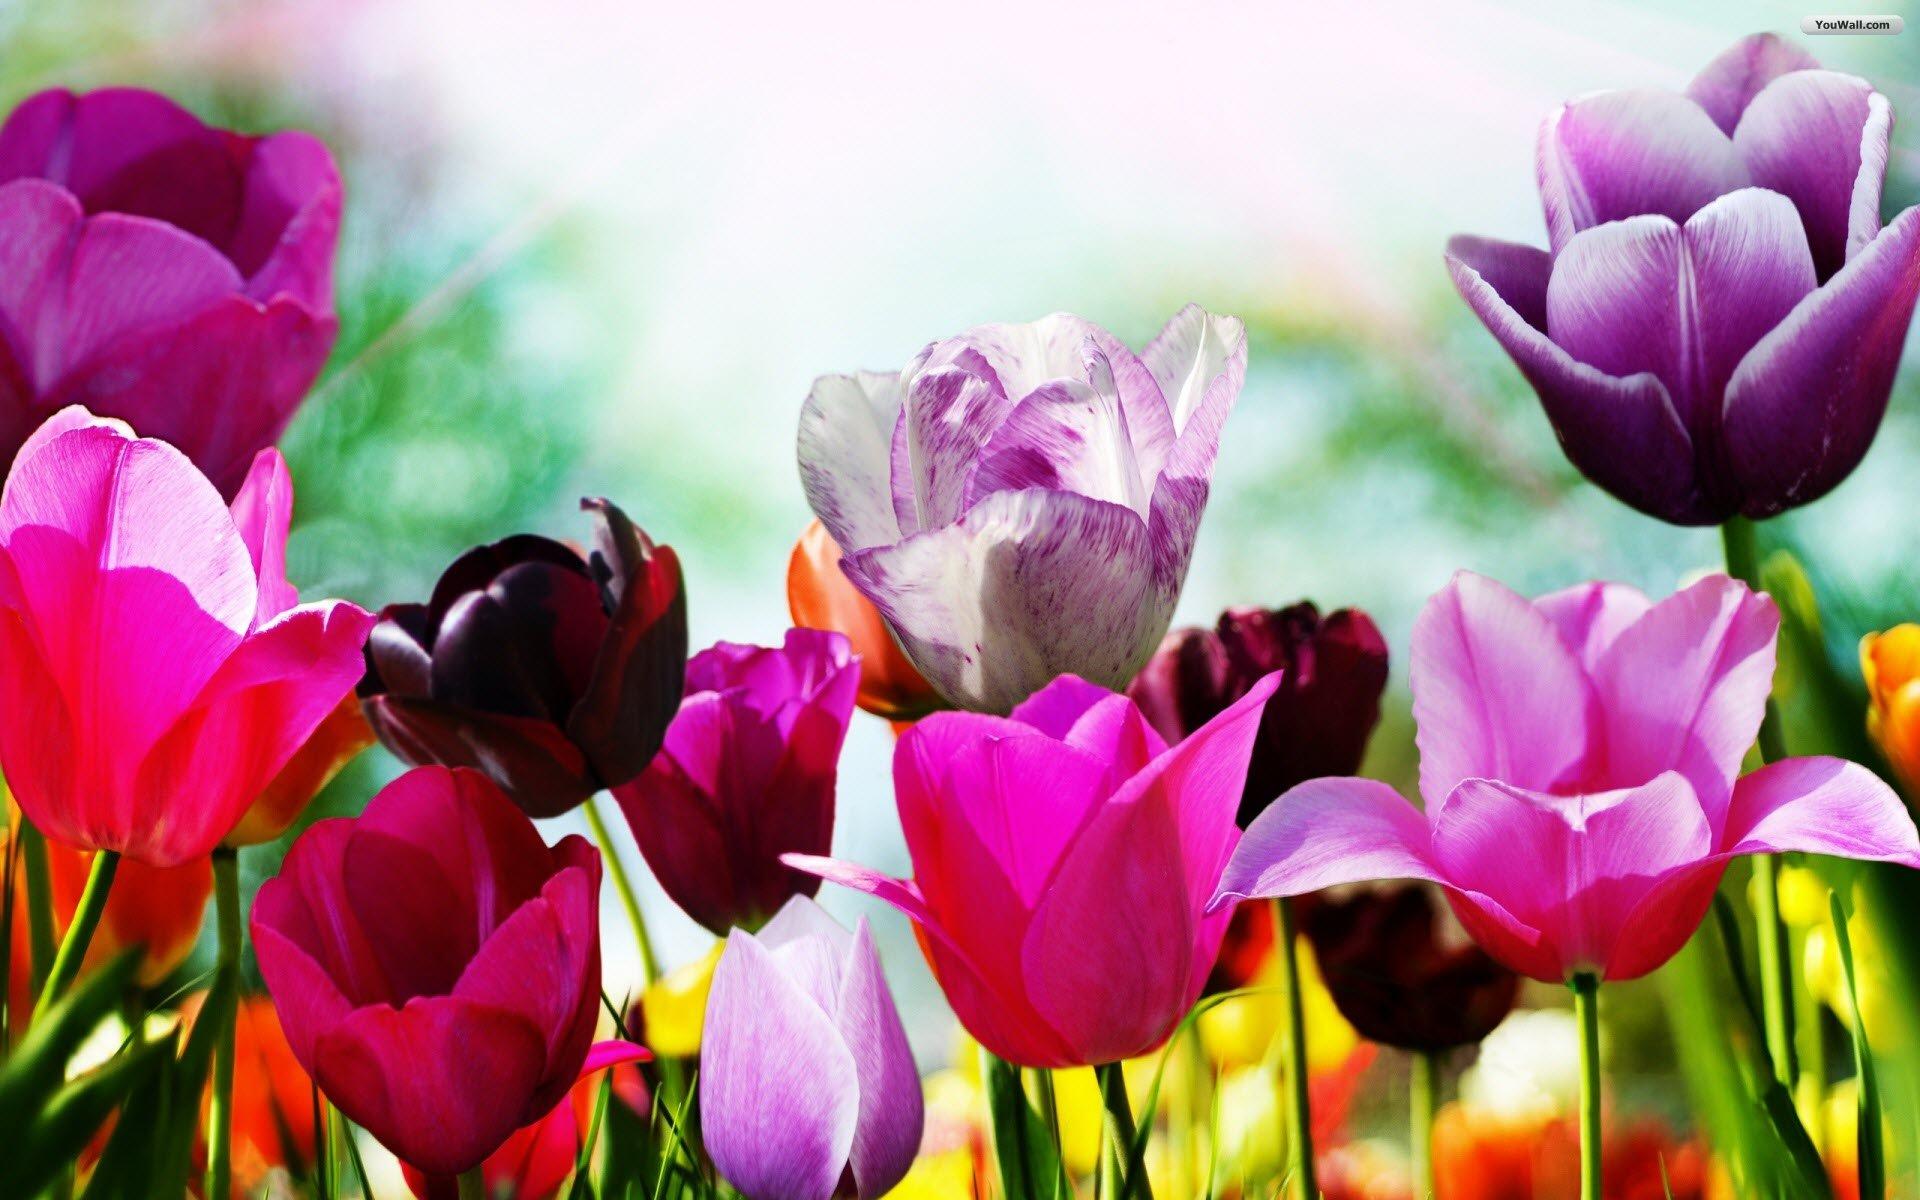 Spring Wallpaper   wallpaperwallpapersfree wallpaperphotodesktop 1920x1200